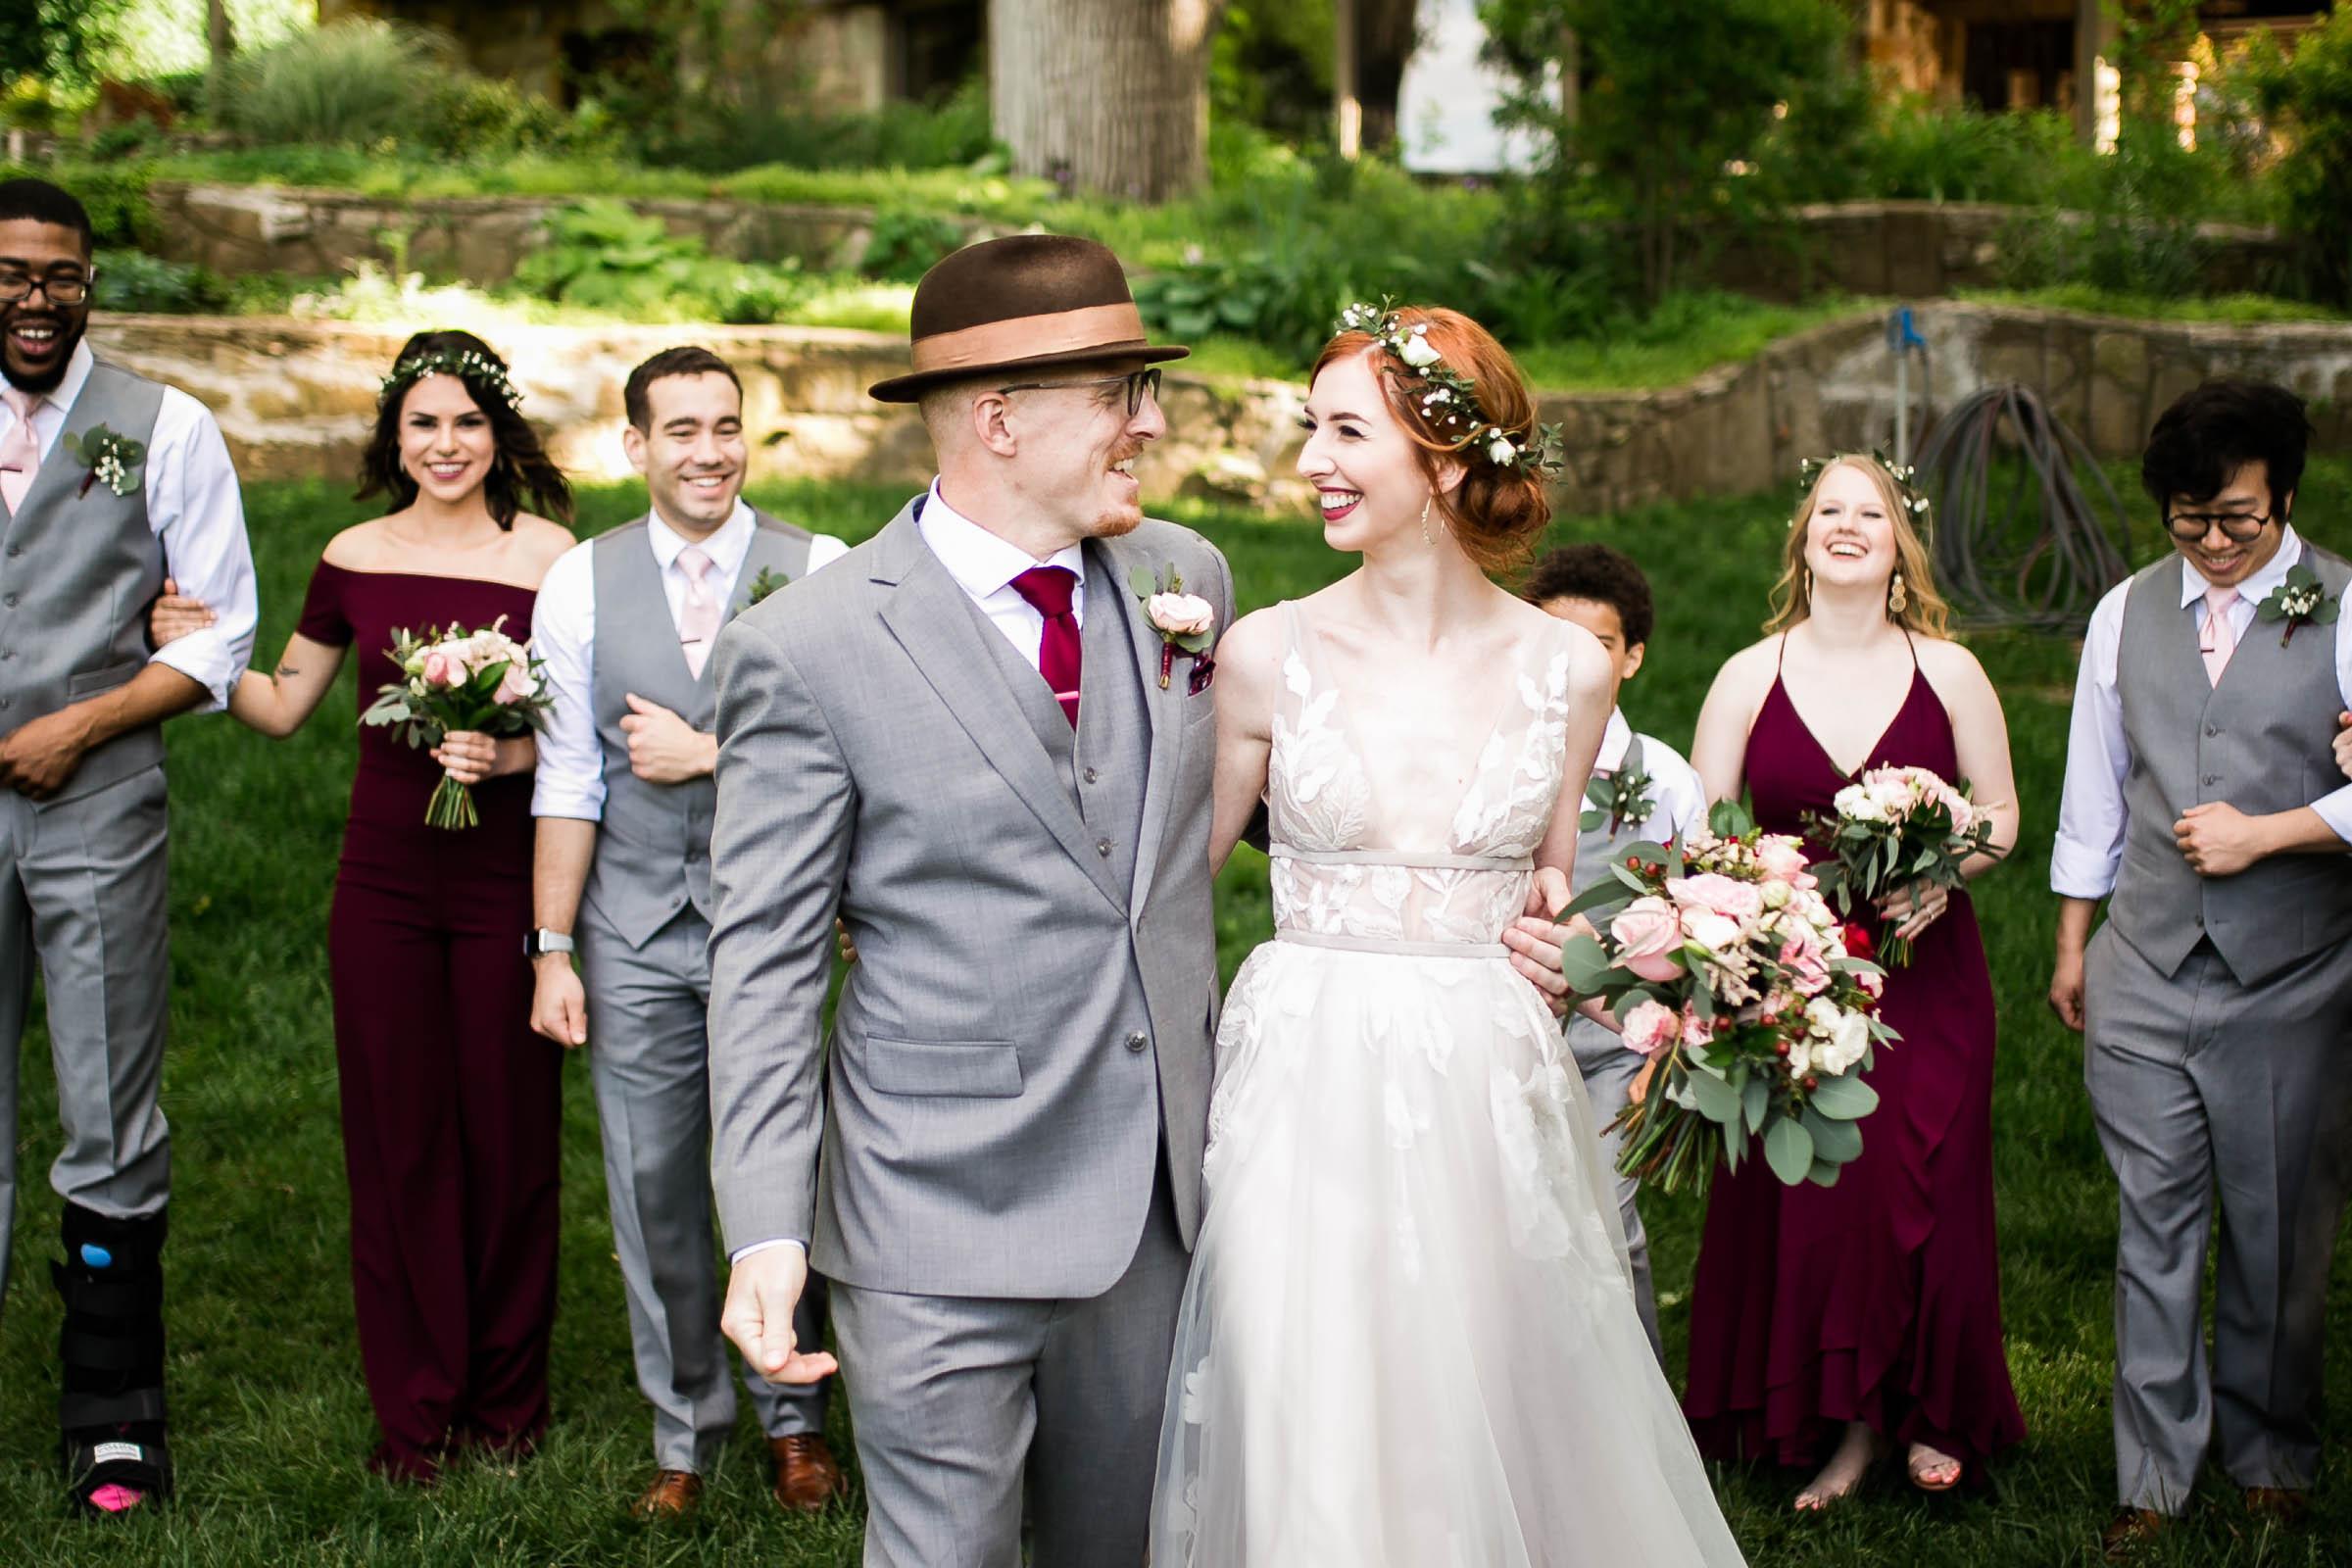 armstrong-wedding-355edit.jpg